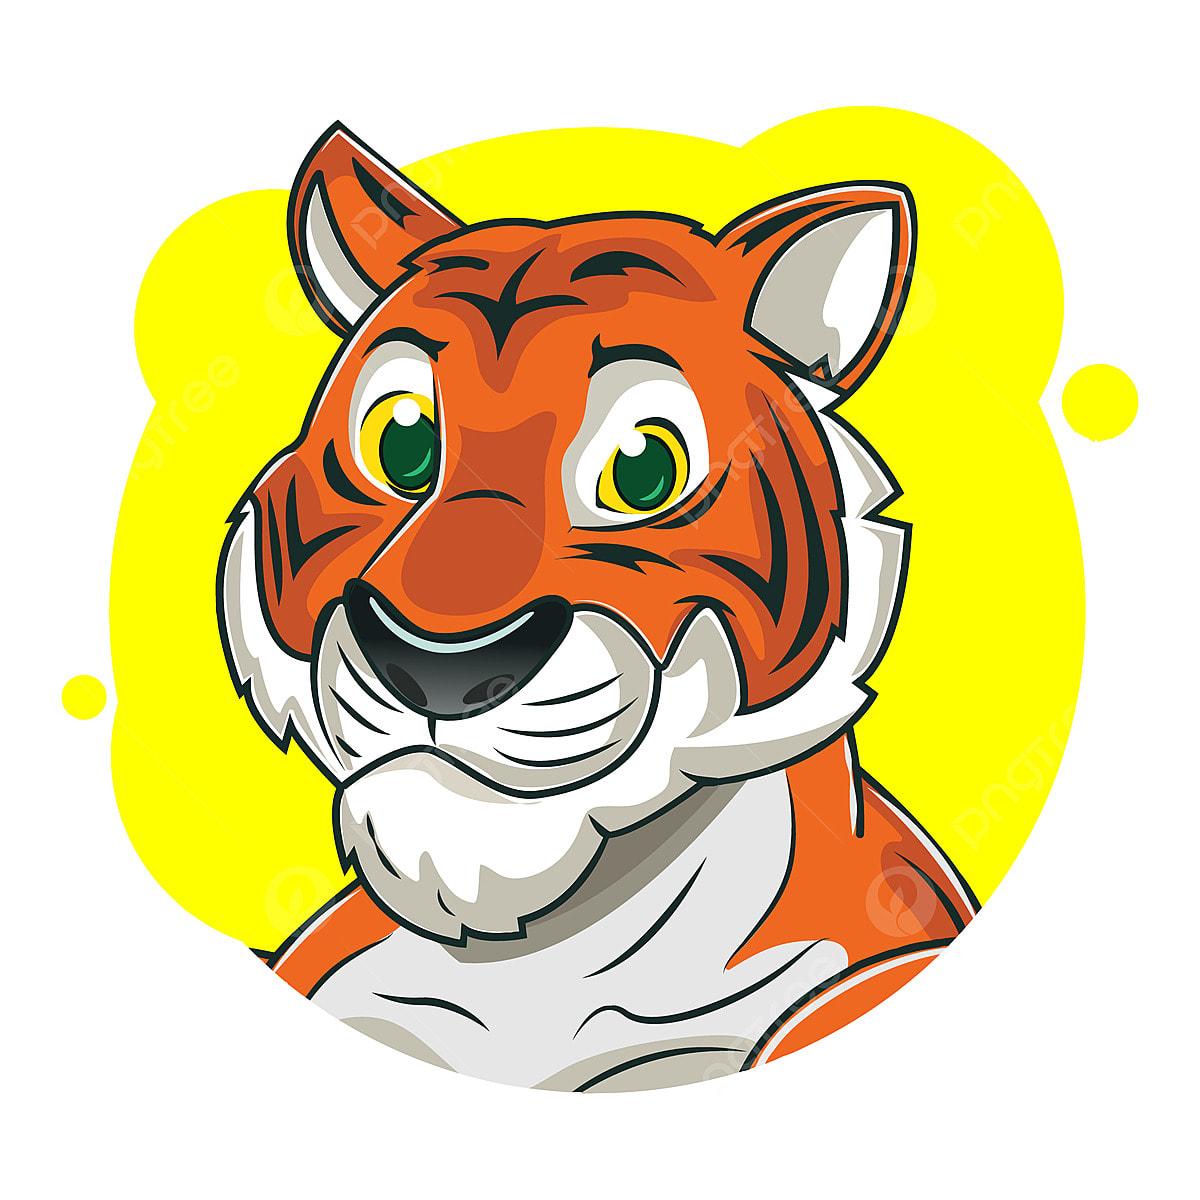 Gambar Avatar Harimau Lucu Dengan Latar Belakang Kuning Avatar Pasar Web Png Dan Vektor Dengan Latar Belakang Transparan Untuk Unduh Gratis